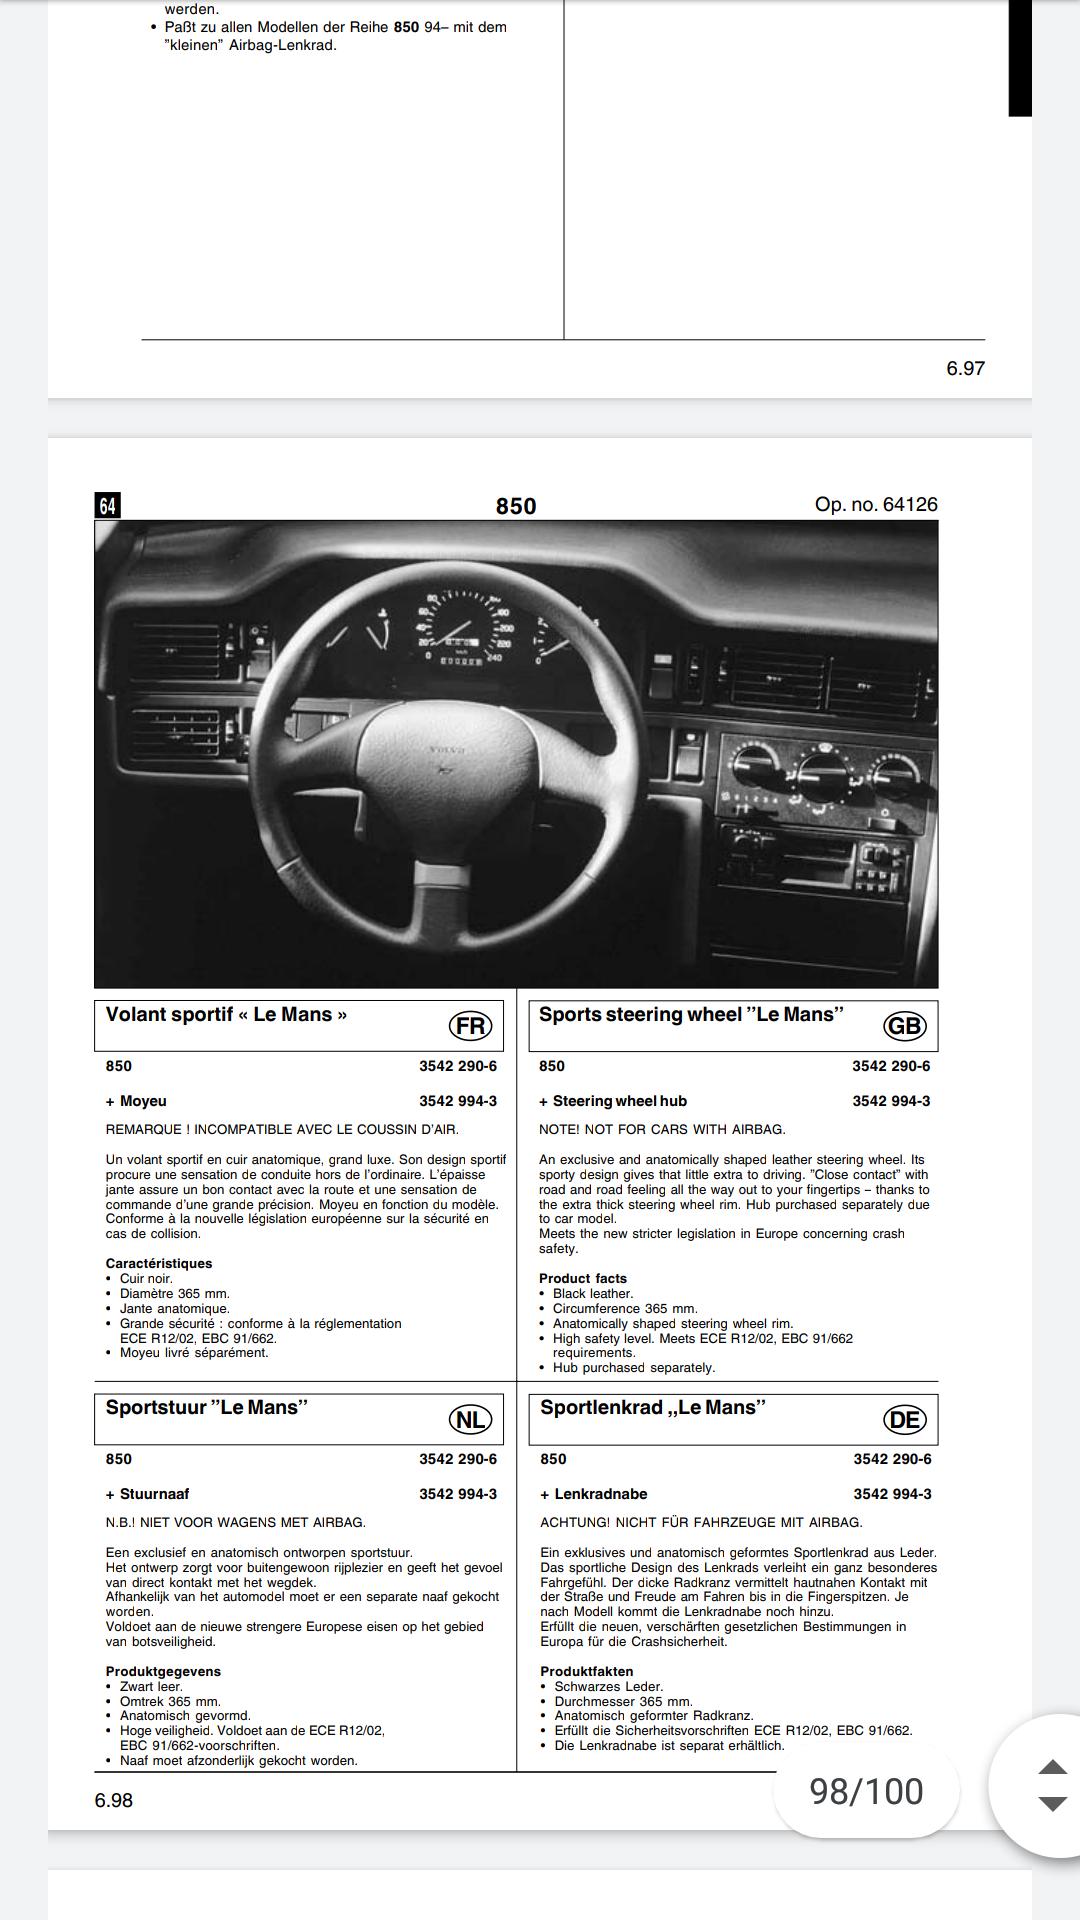 Screenshot_2020-02-11-17-30-57-60.png